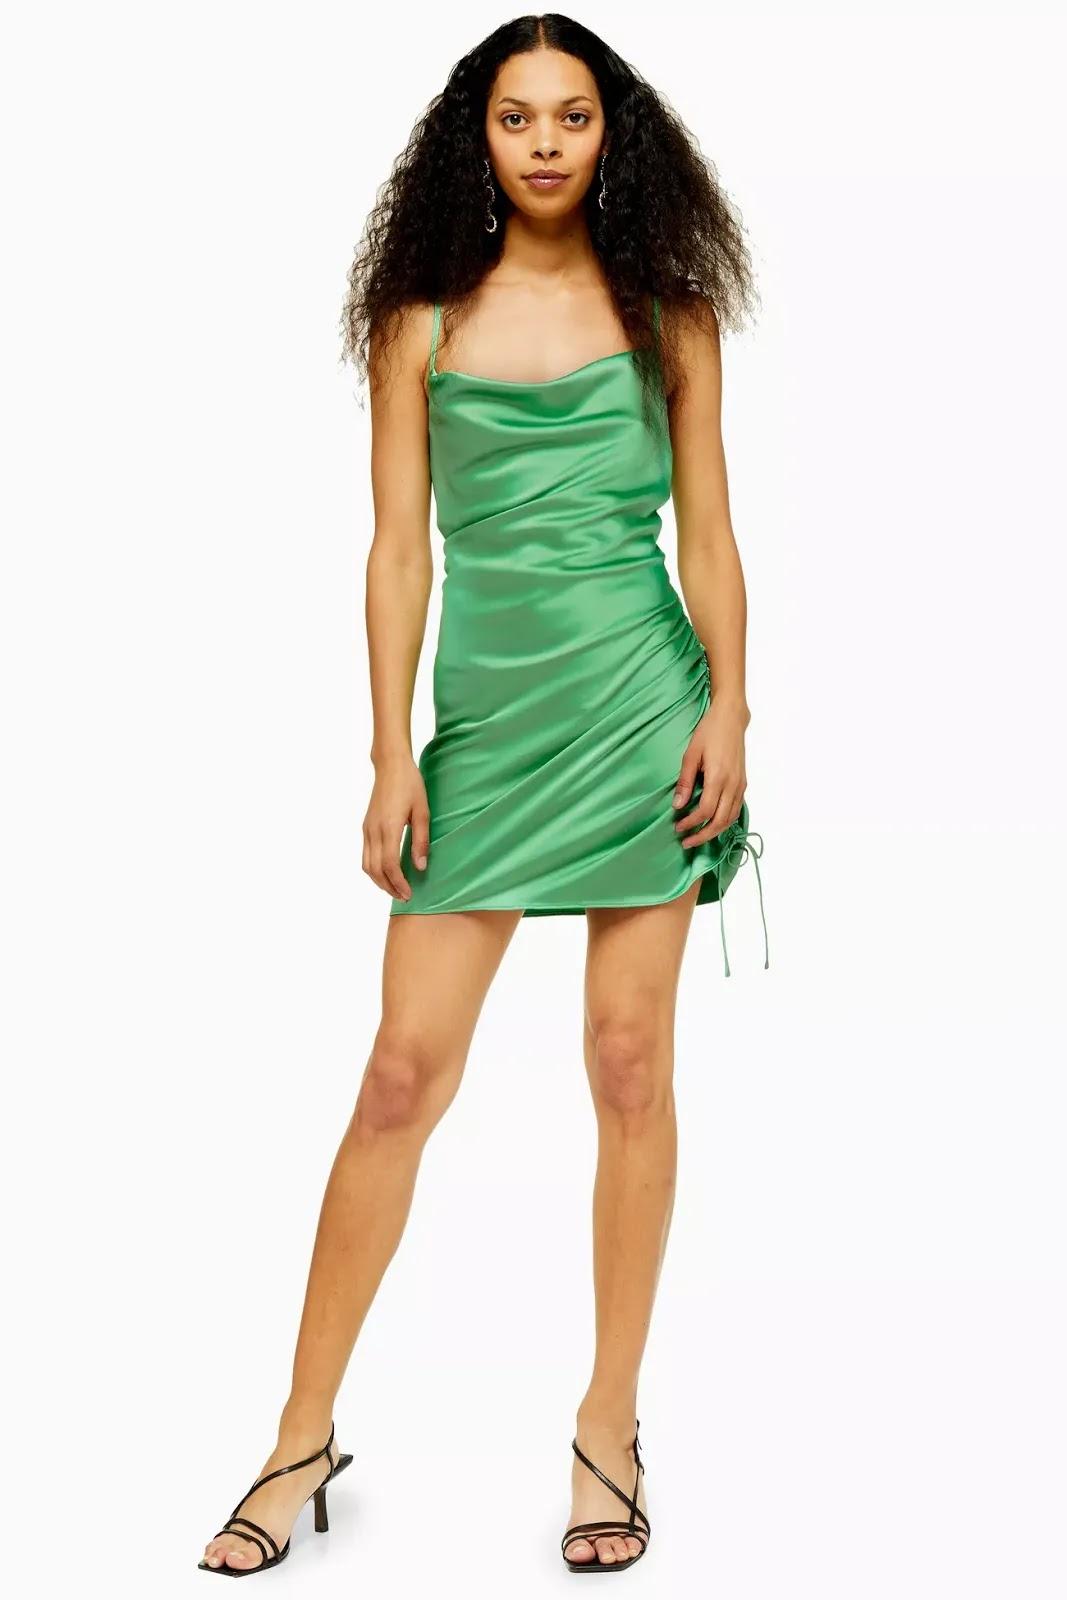 PETITE Green Ruch Side Dress